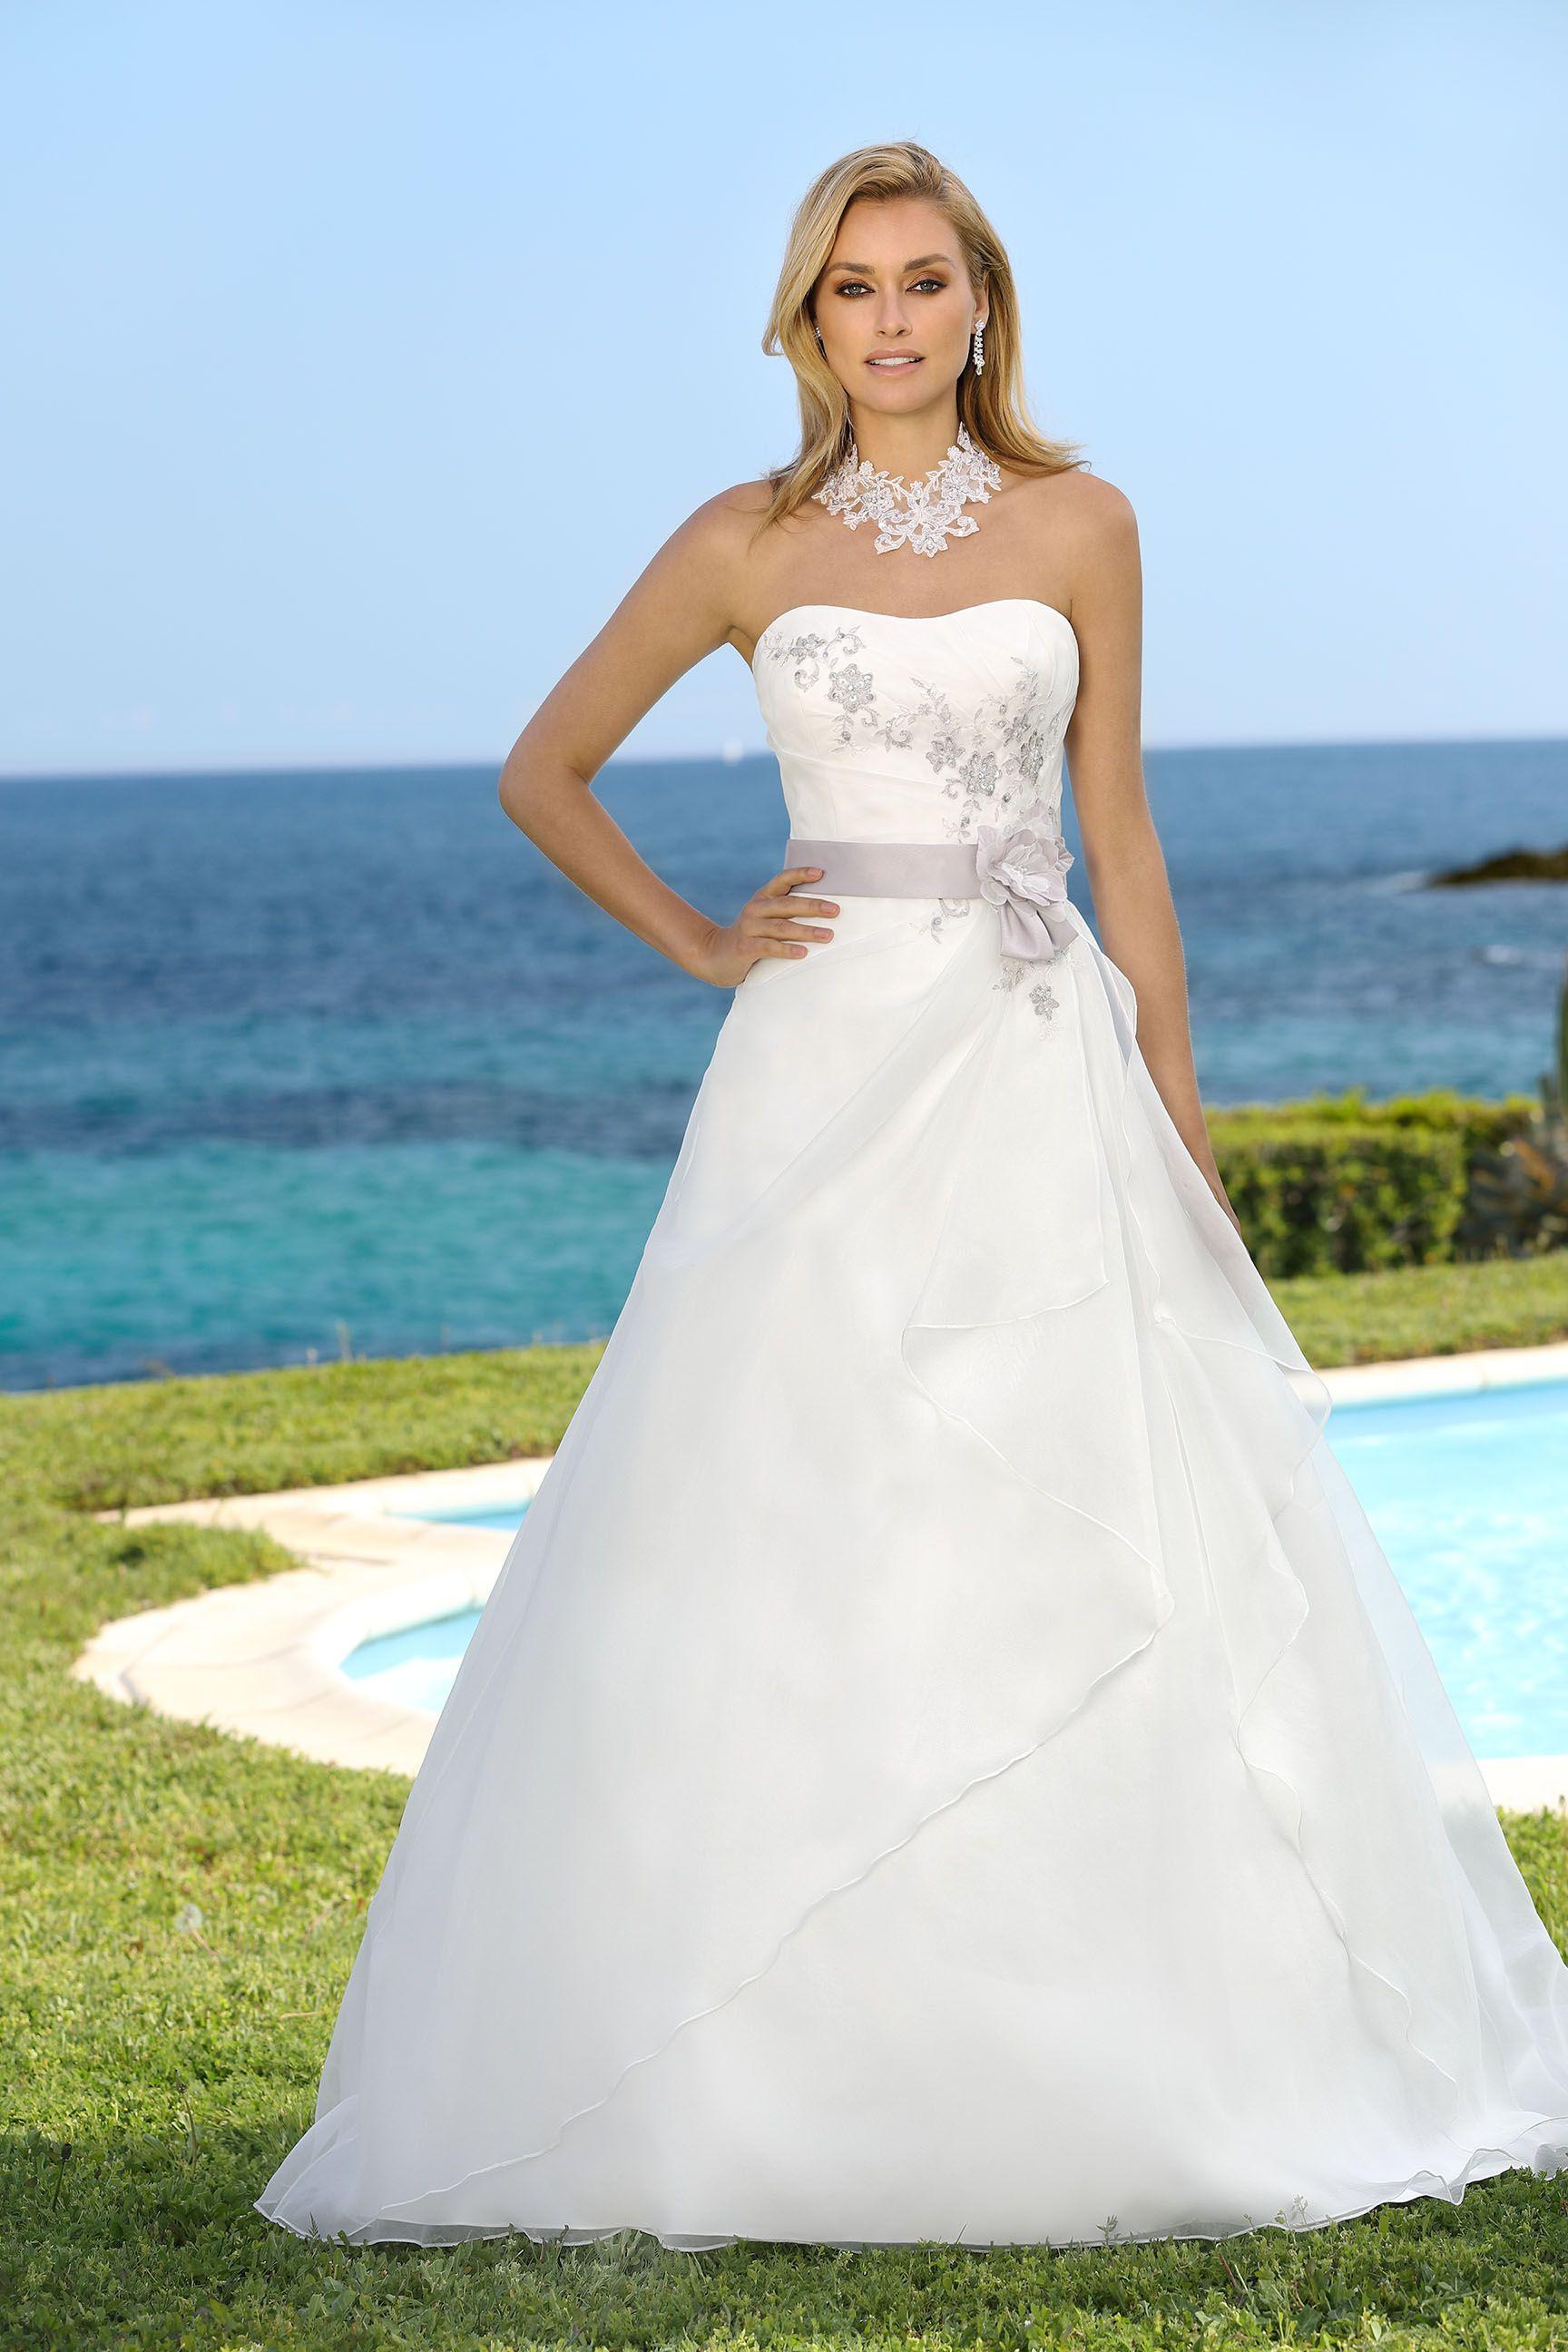 Best Wedding Dress Shops In Lexington Ky Ideas - Wedding Ideas ...